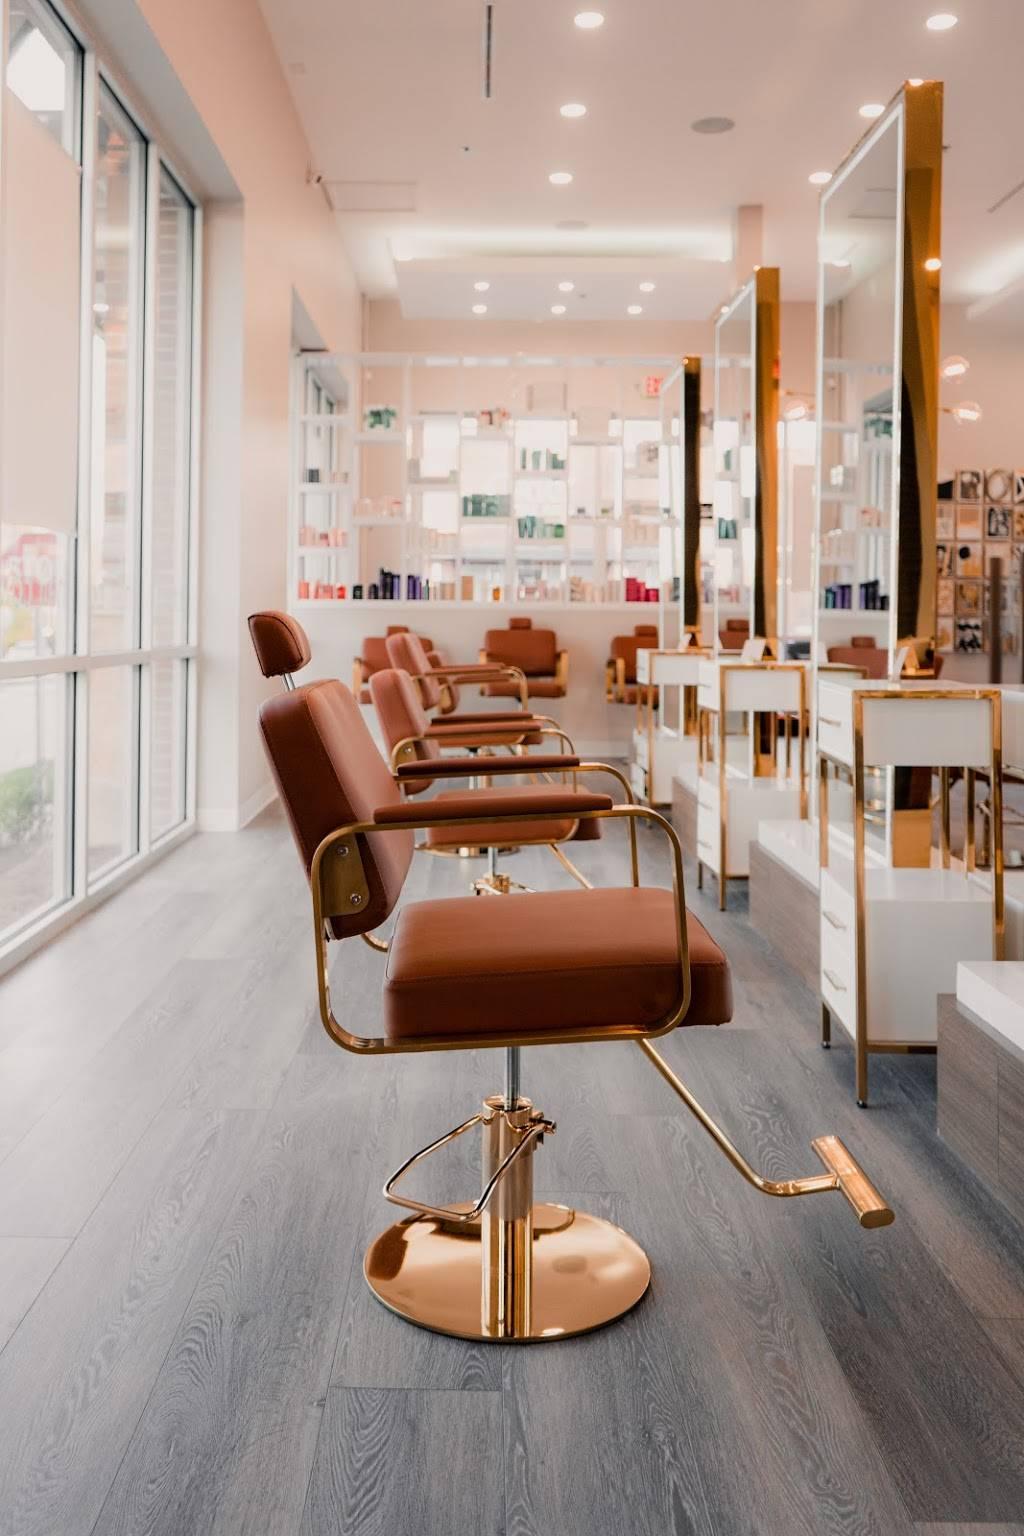 Tina Vora Salon & Spa - hair care  | Photo 2 of 5 | Address: 347 Sembler Ln, Cary, NC 27519, USA | Phone: (919) 377-8100